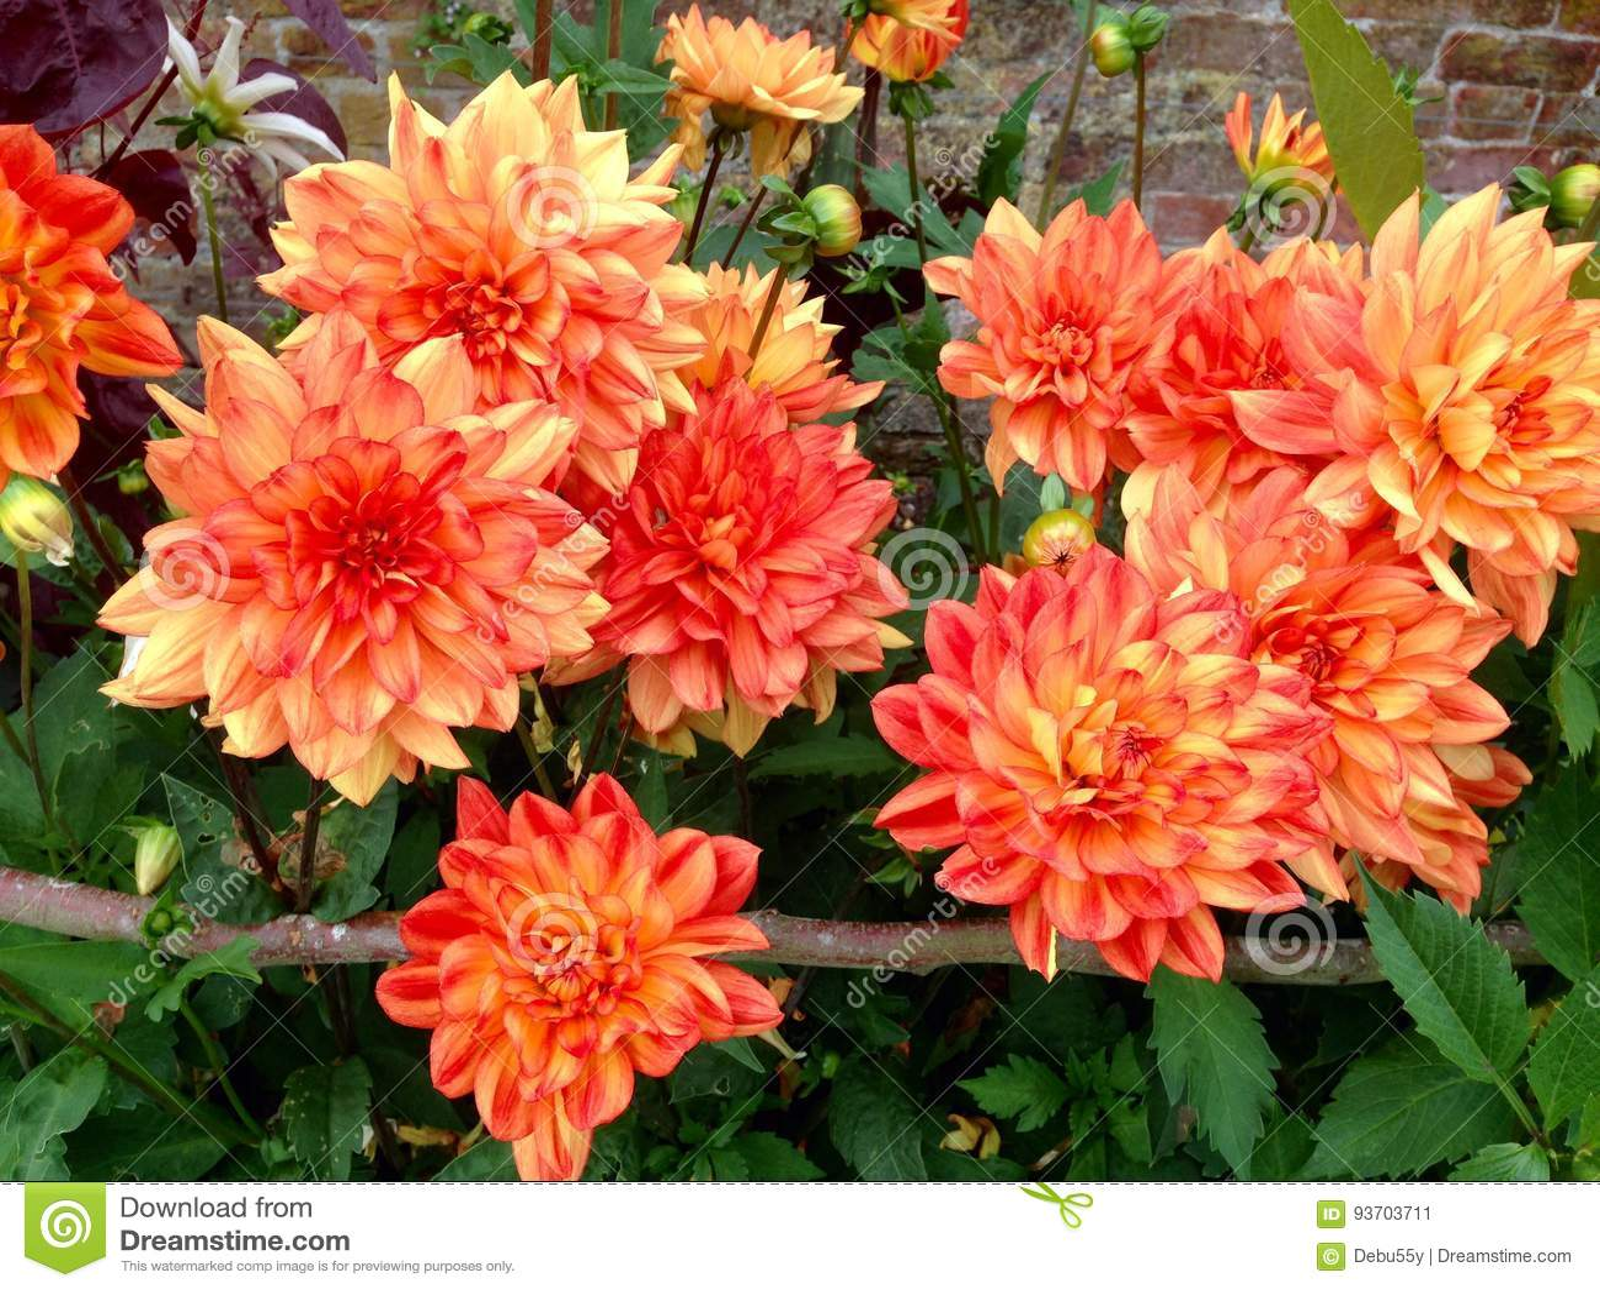 Large Orange Dahlia Flower Heads In A Garden Stock Image Image Of